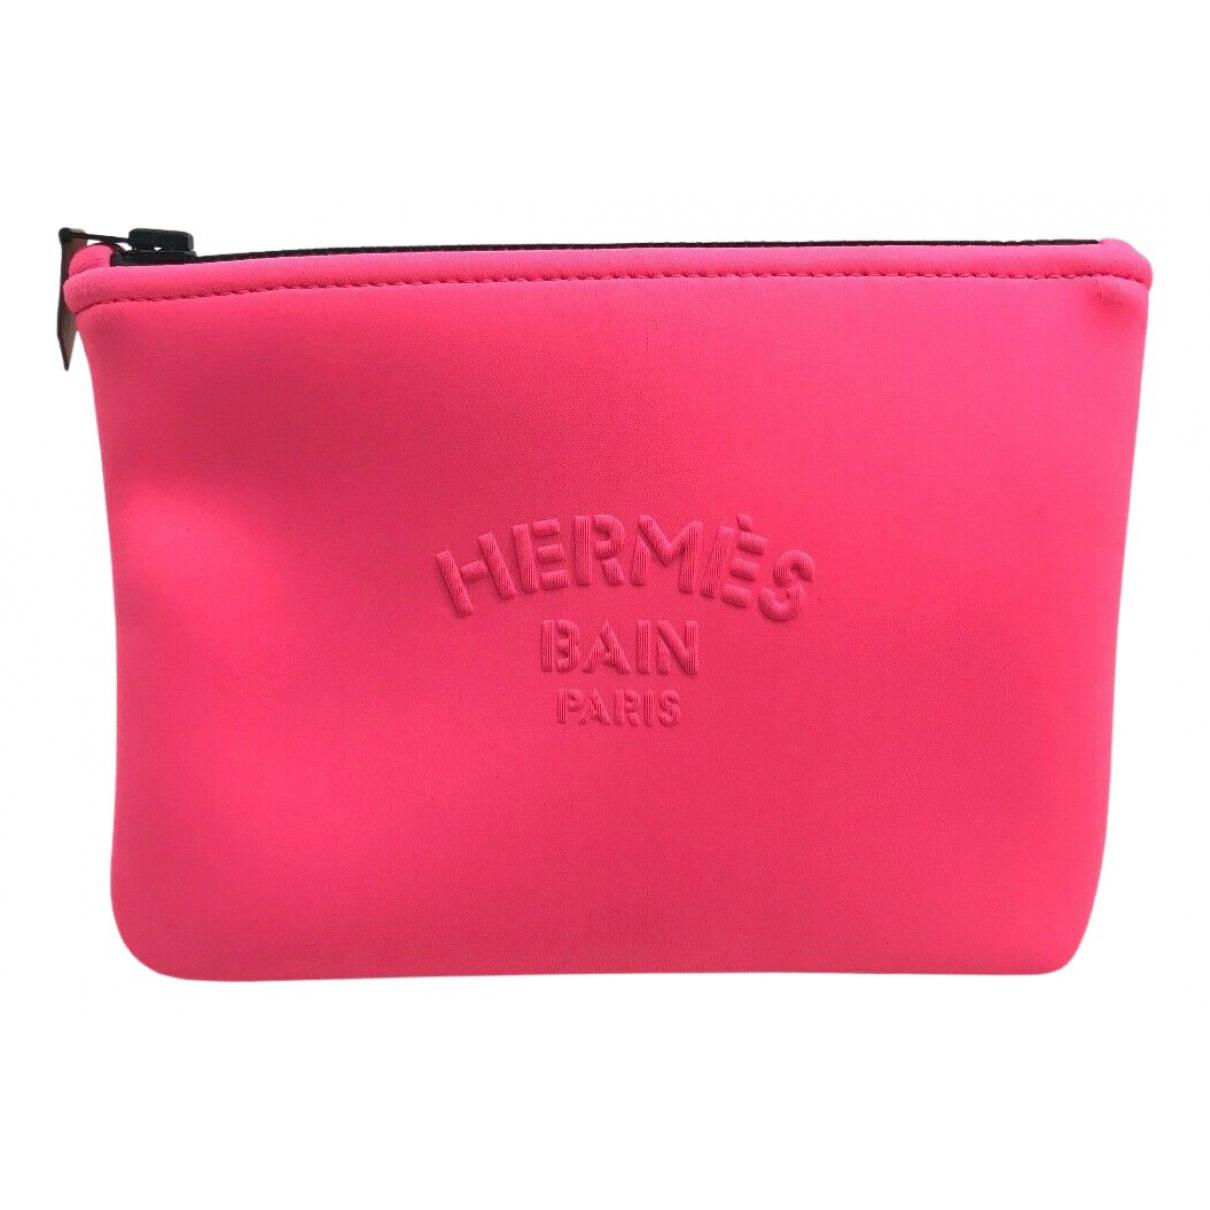 Hermès N Pink Cloth Purses, wallet & cases for Women N